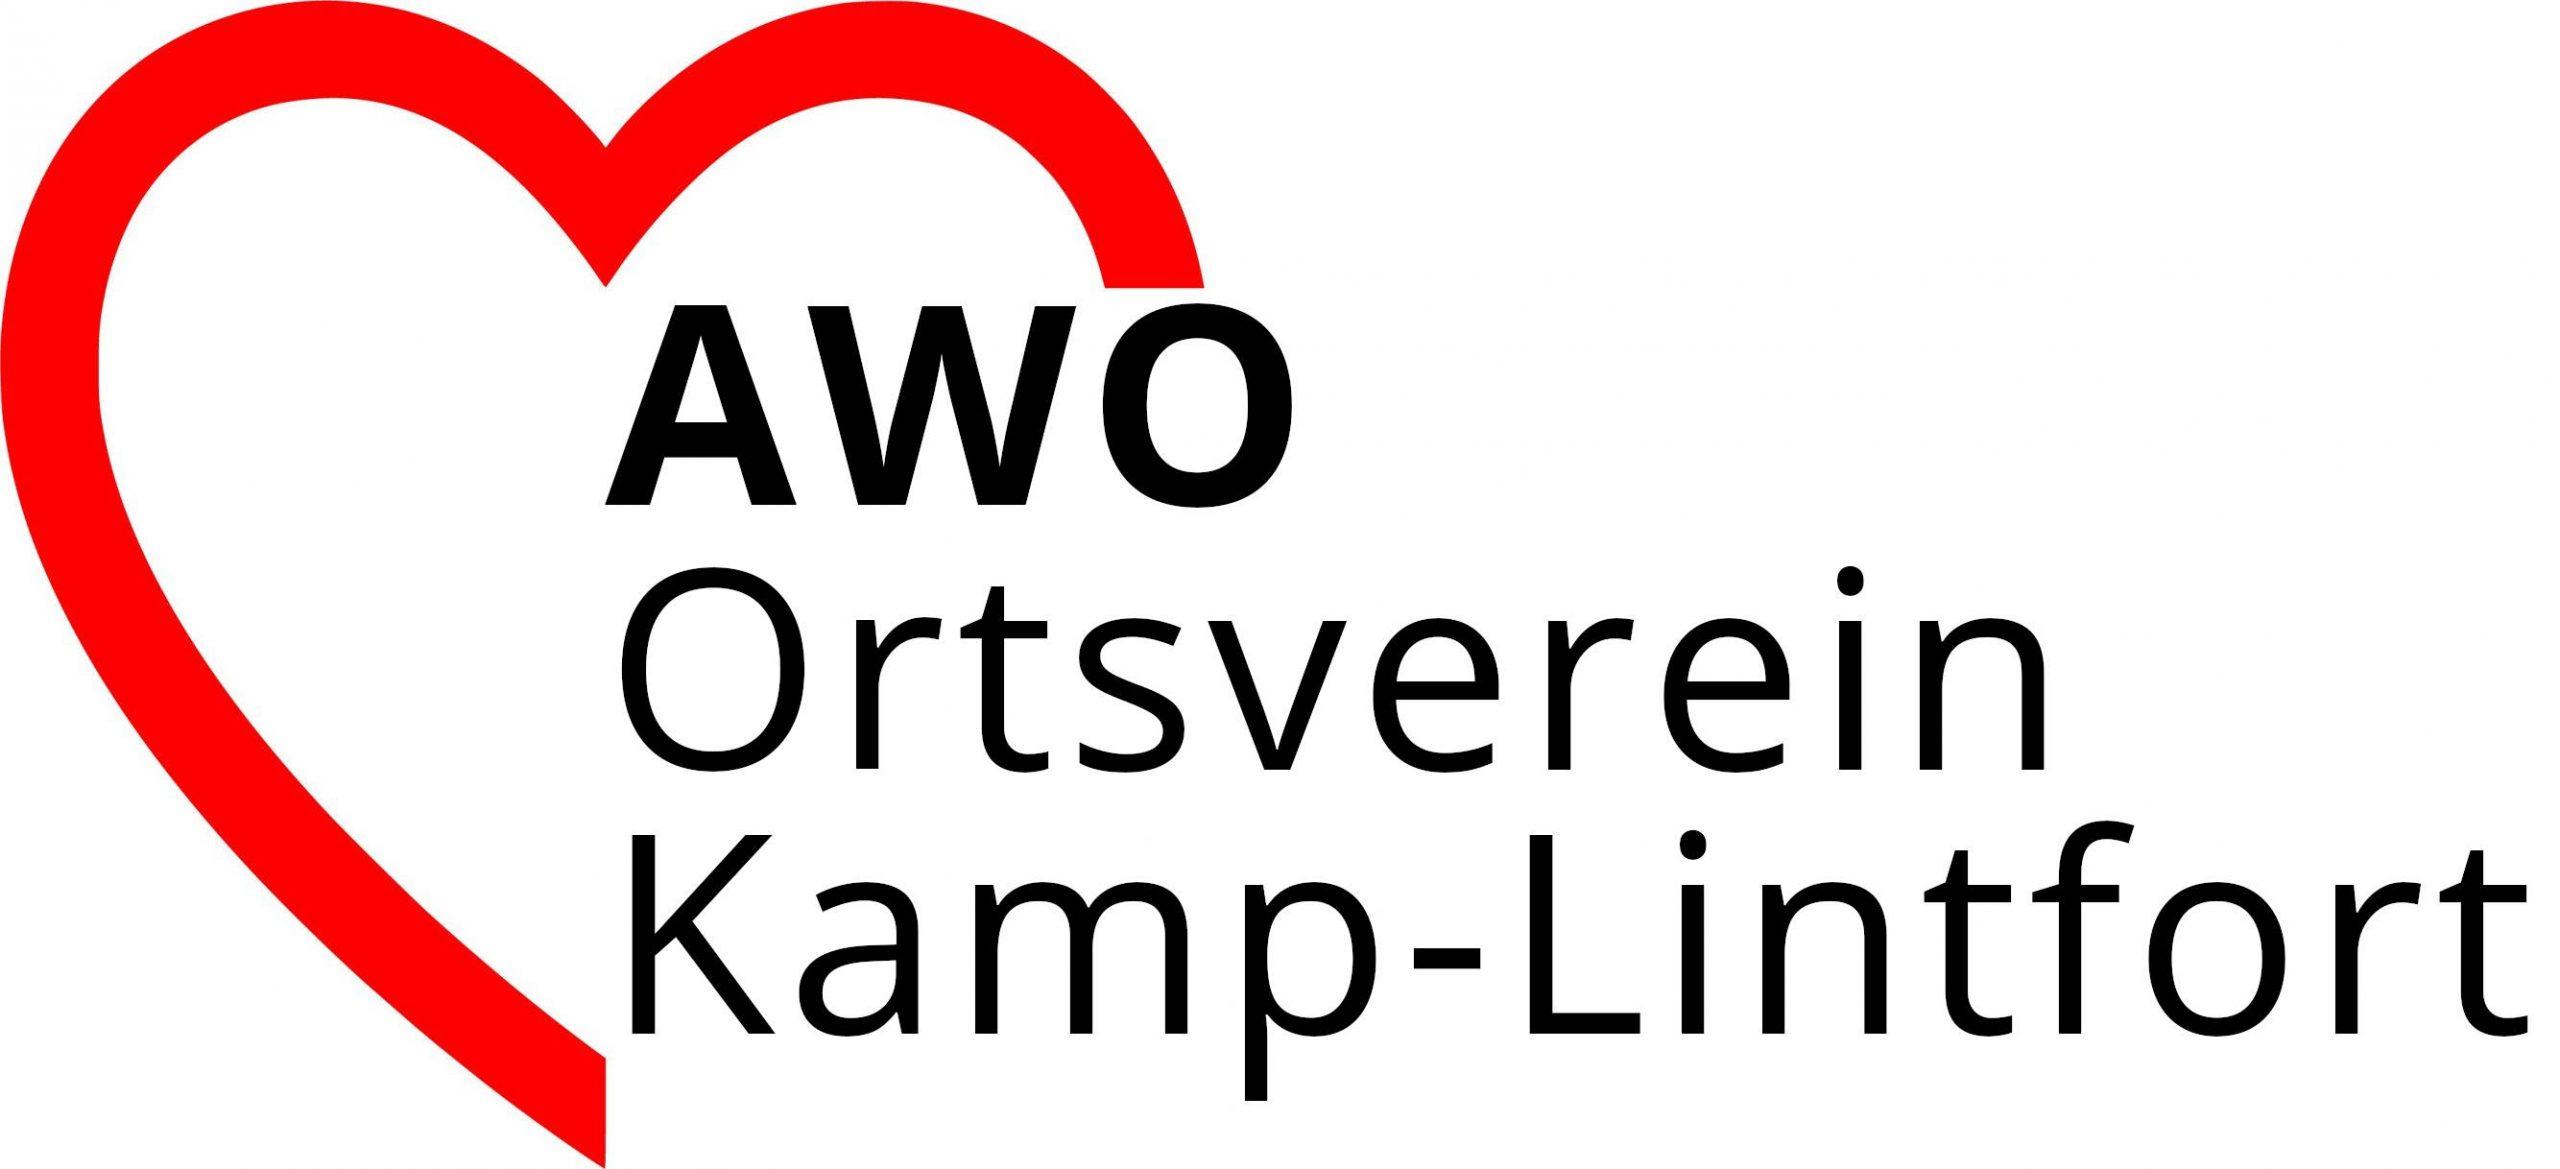 AWO Ortsverein Kamp-Lintfort